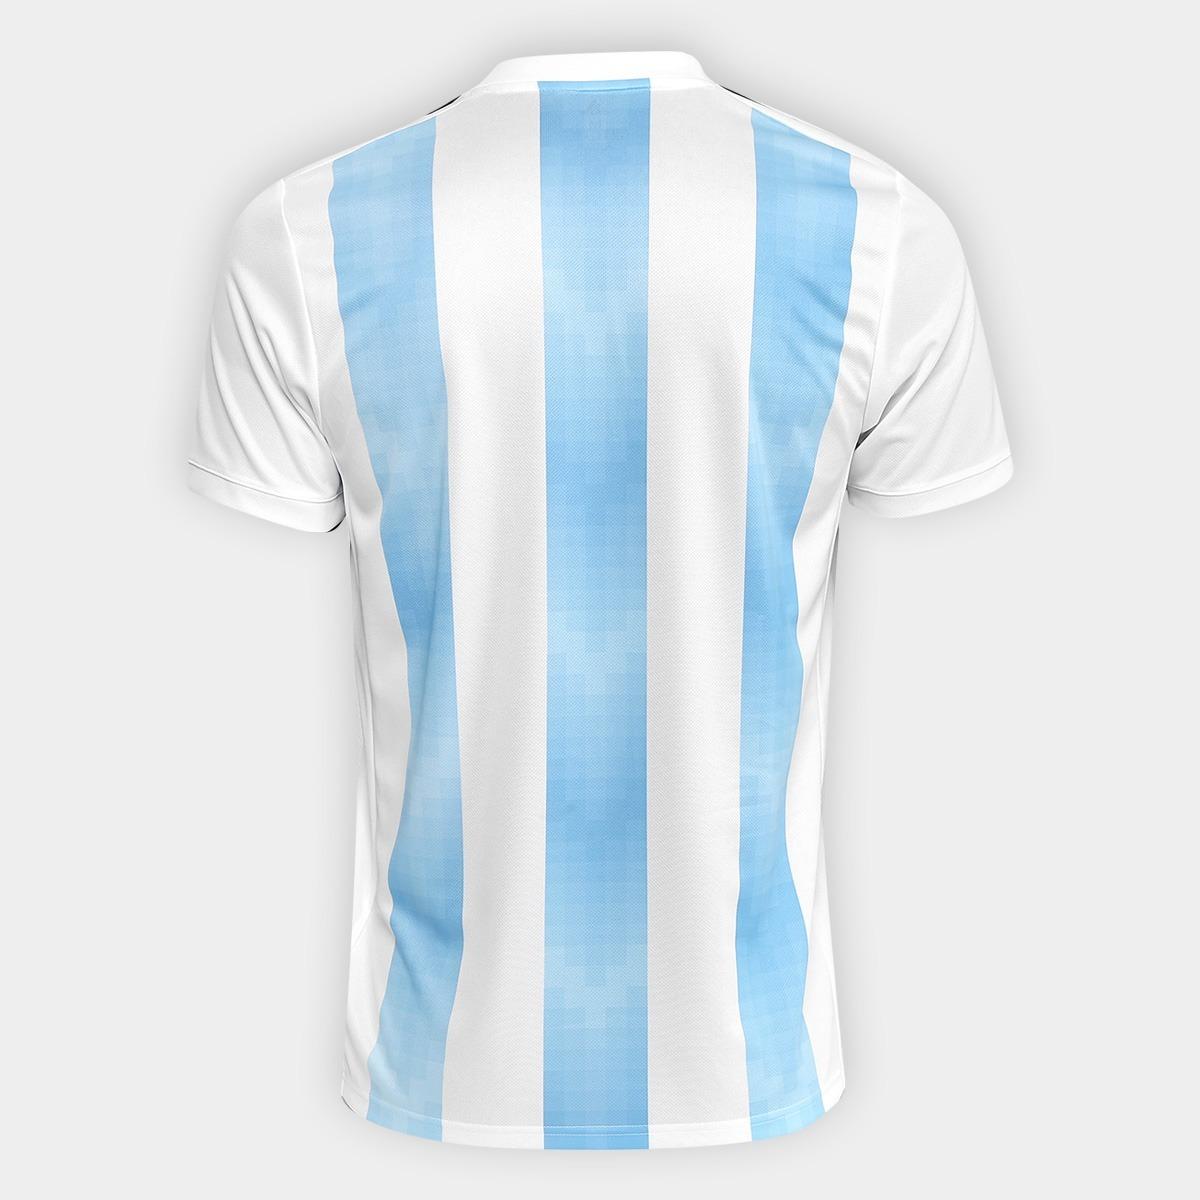 1eee3ac7c8 camisa argentina 2018 home listrada encomenda personalizável. Carregando  zoom.